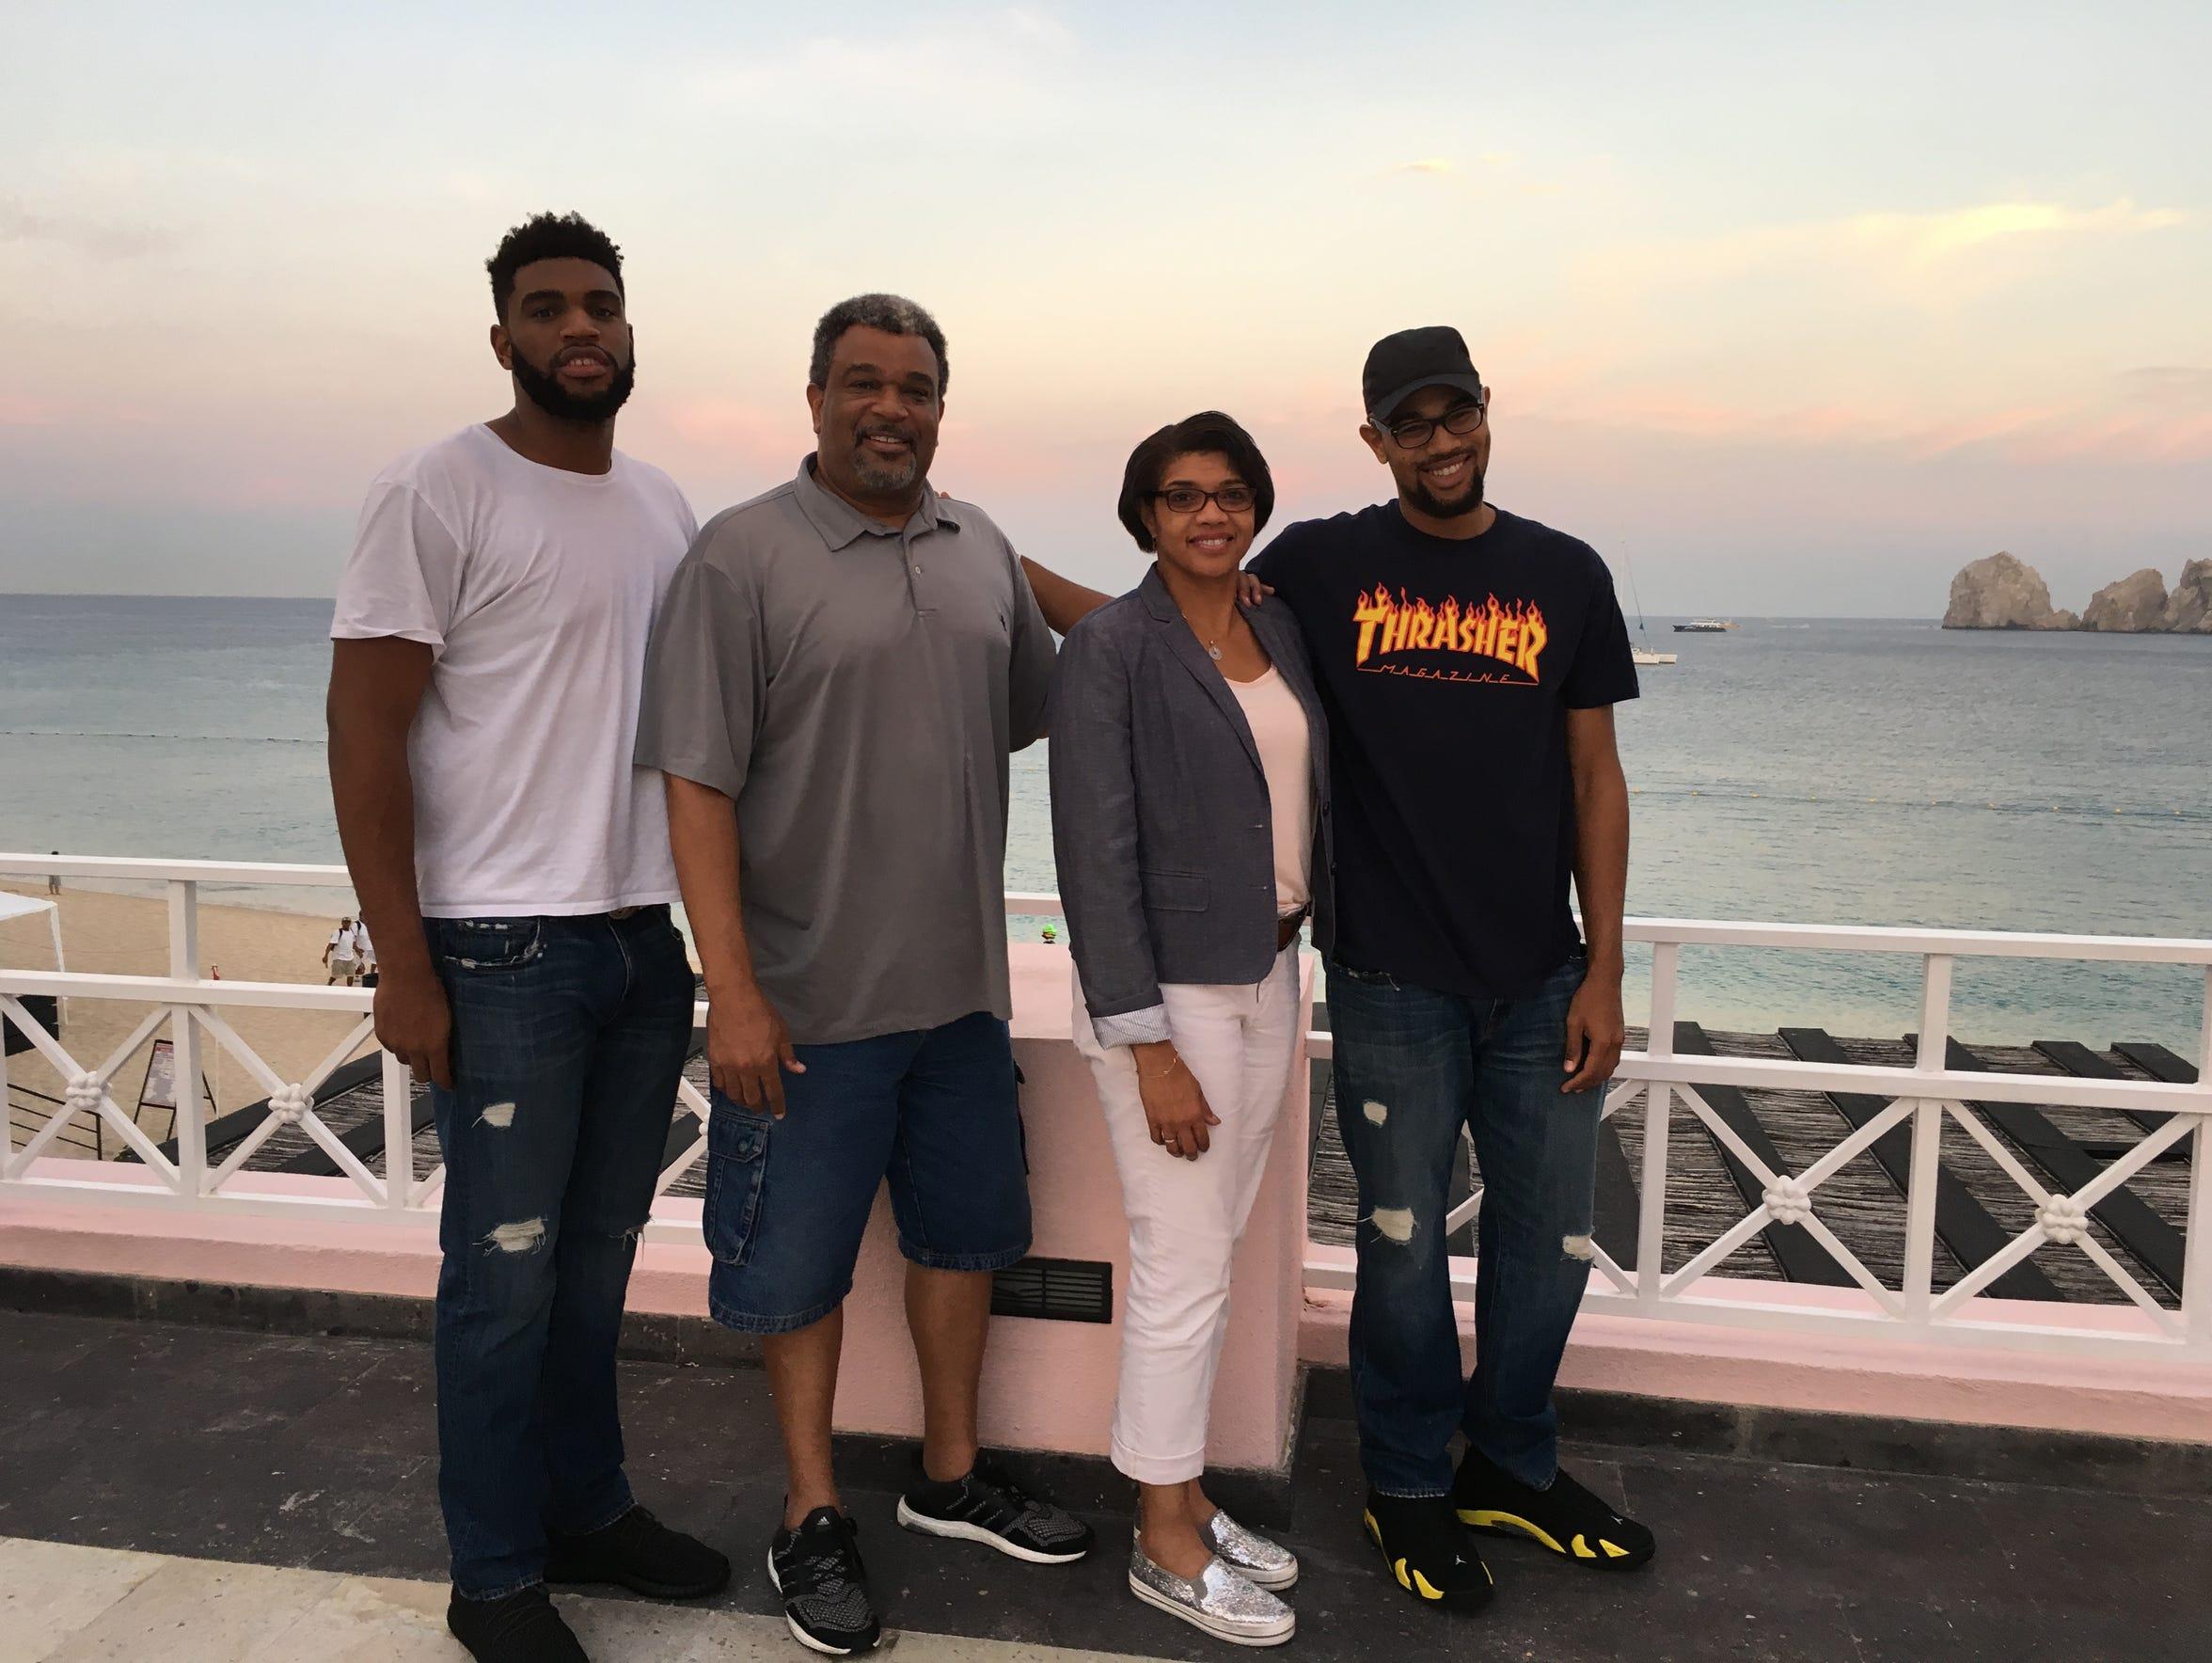 The Williams family (L-R: Alan, Cody Sr., Jeri and